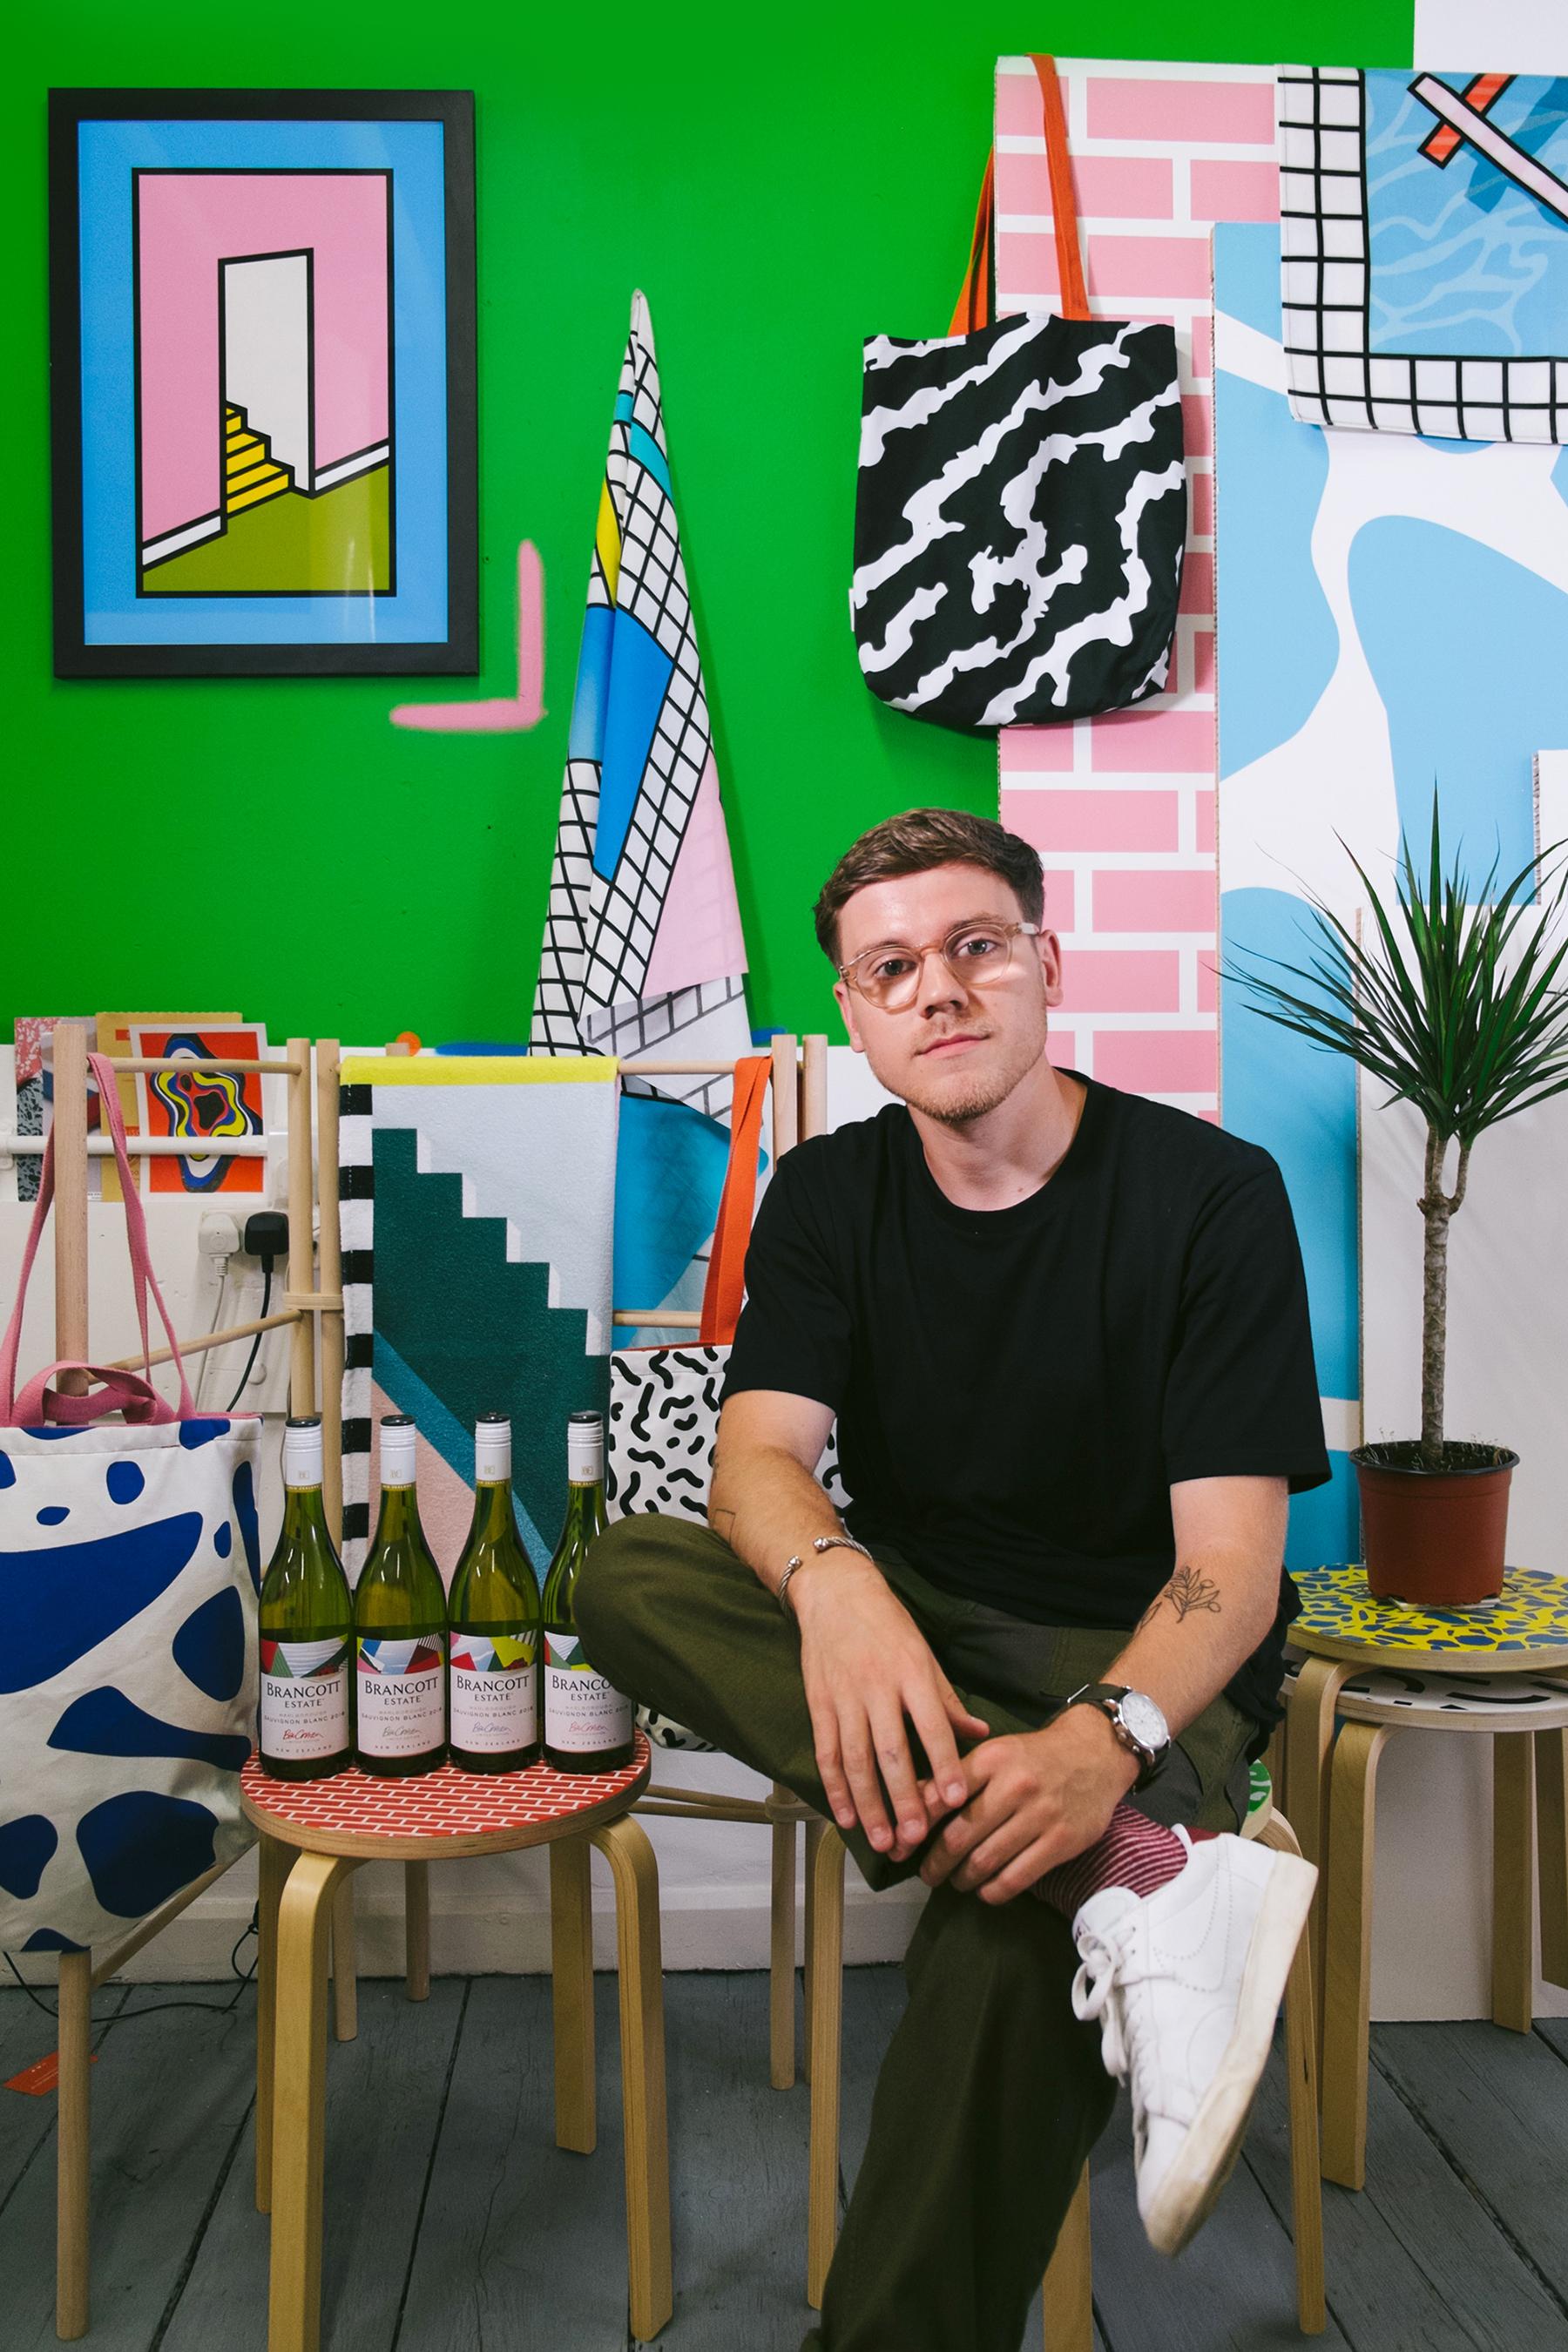 Benjamin Craven in his studio with Brancott Estate Limited Edition bottles